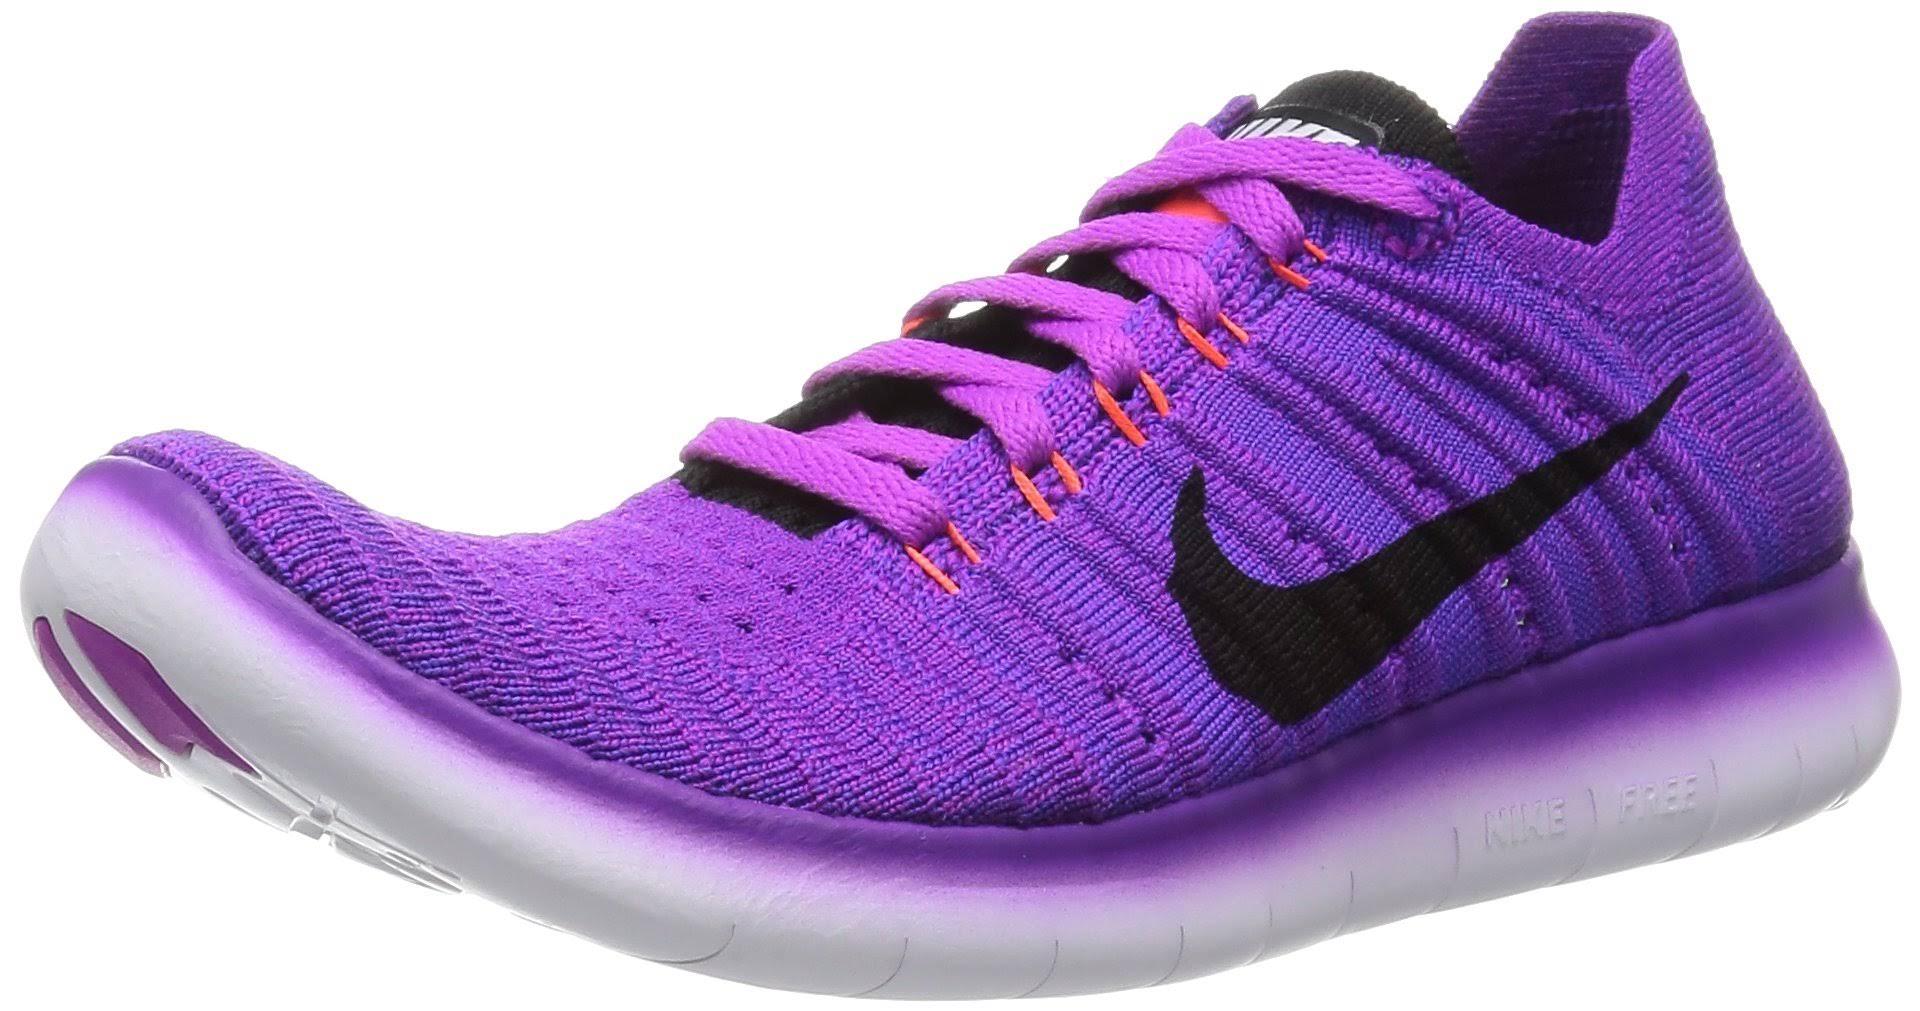 Nike Zapatillas 8 Running Violeta Flyknit Mujer Negro 5 Free Rn De Tamaño Para 4ErzqW4